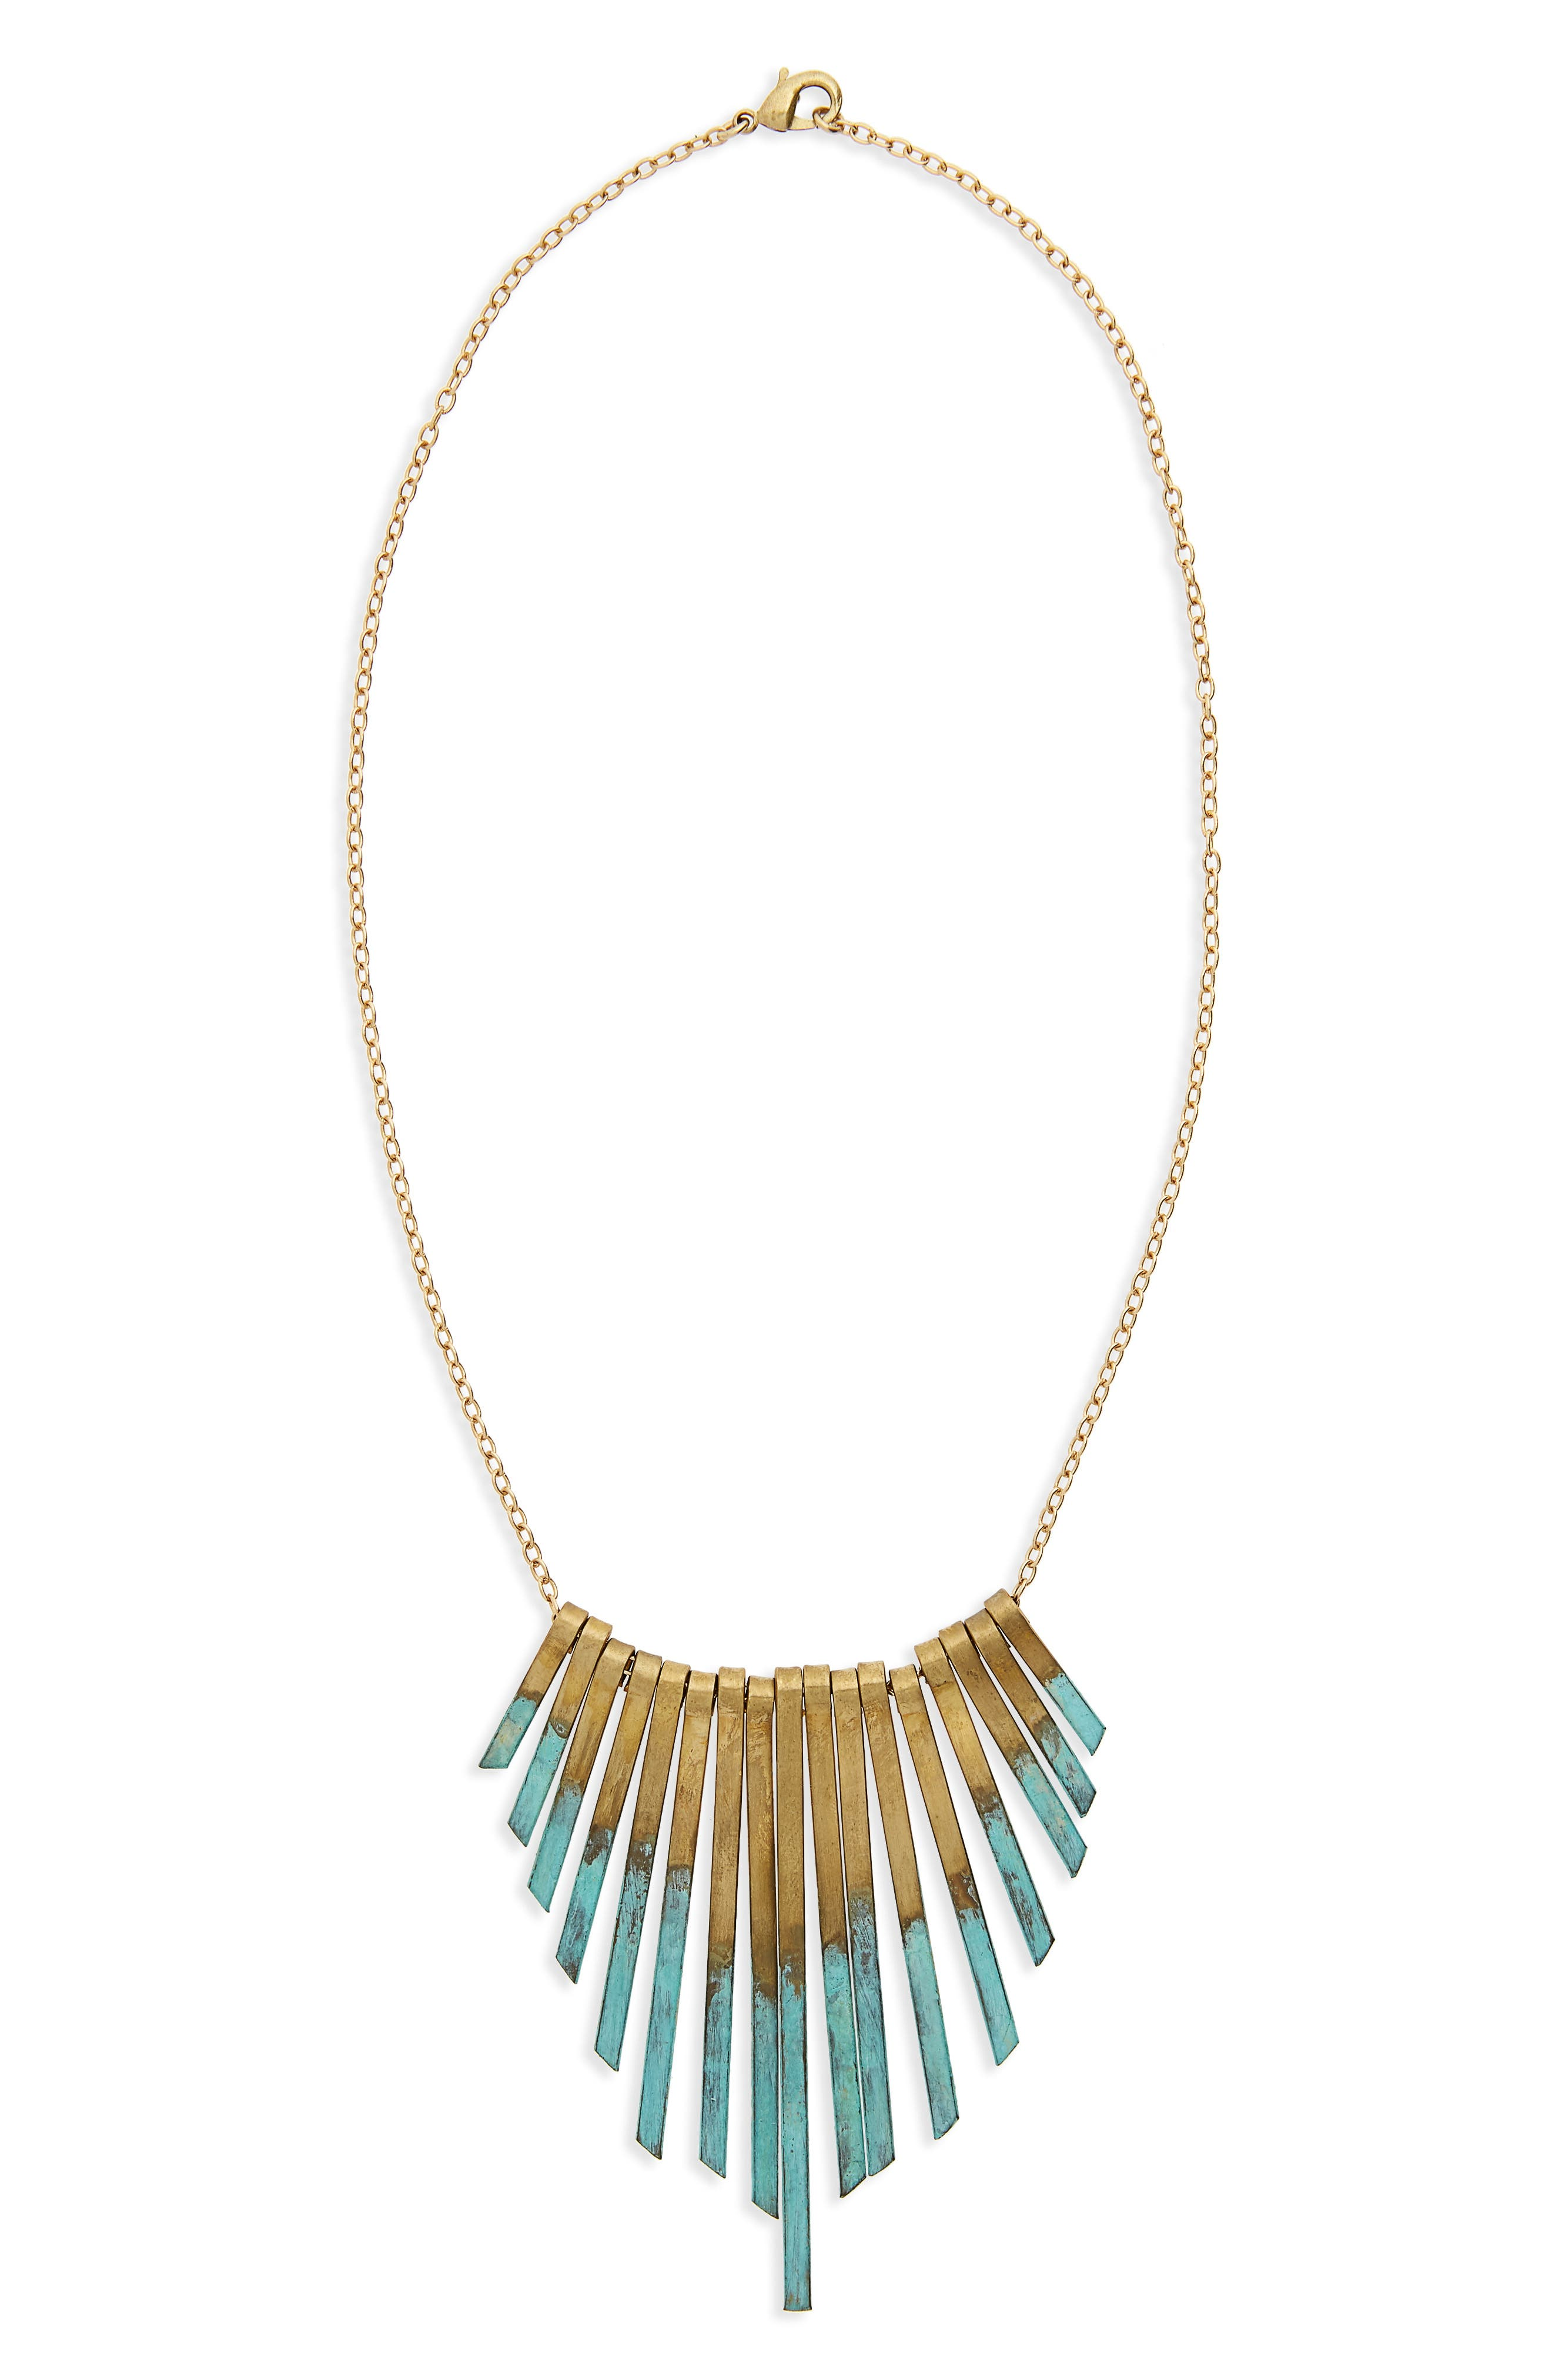 Patina Stick Necklace,                             Main thumbnail 1, color,                             710